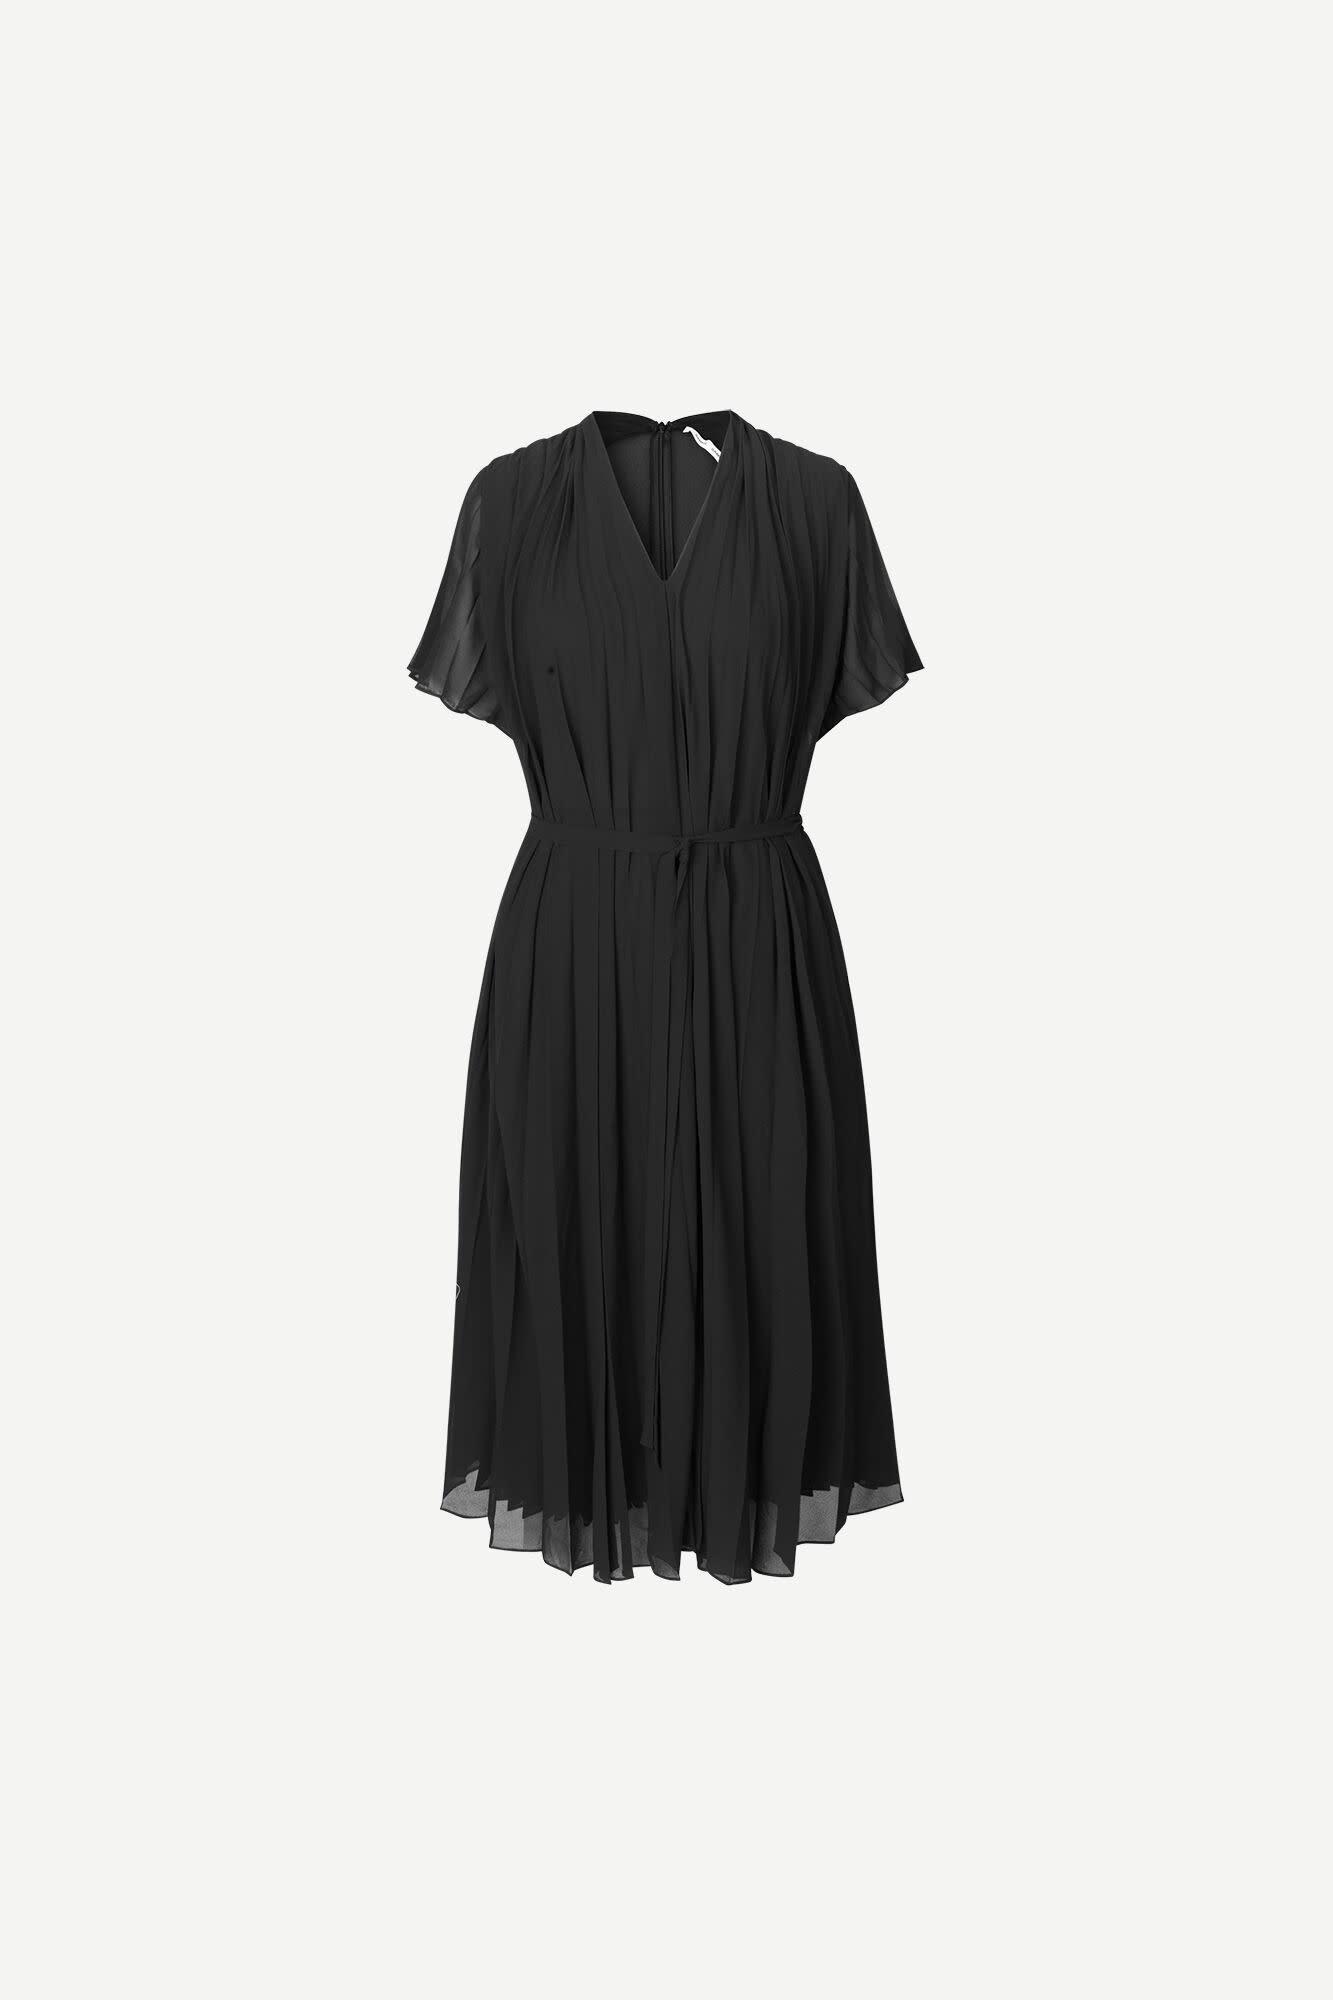 Wala Short Sleeve Pleaded Dress Black-3